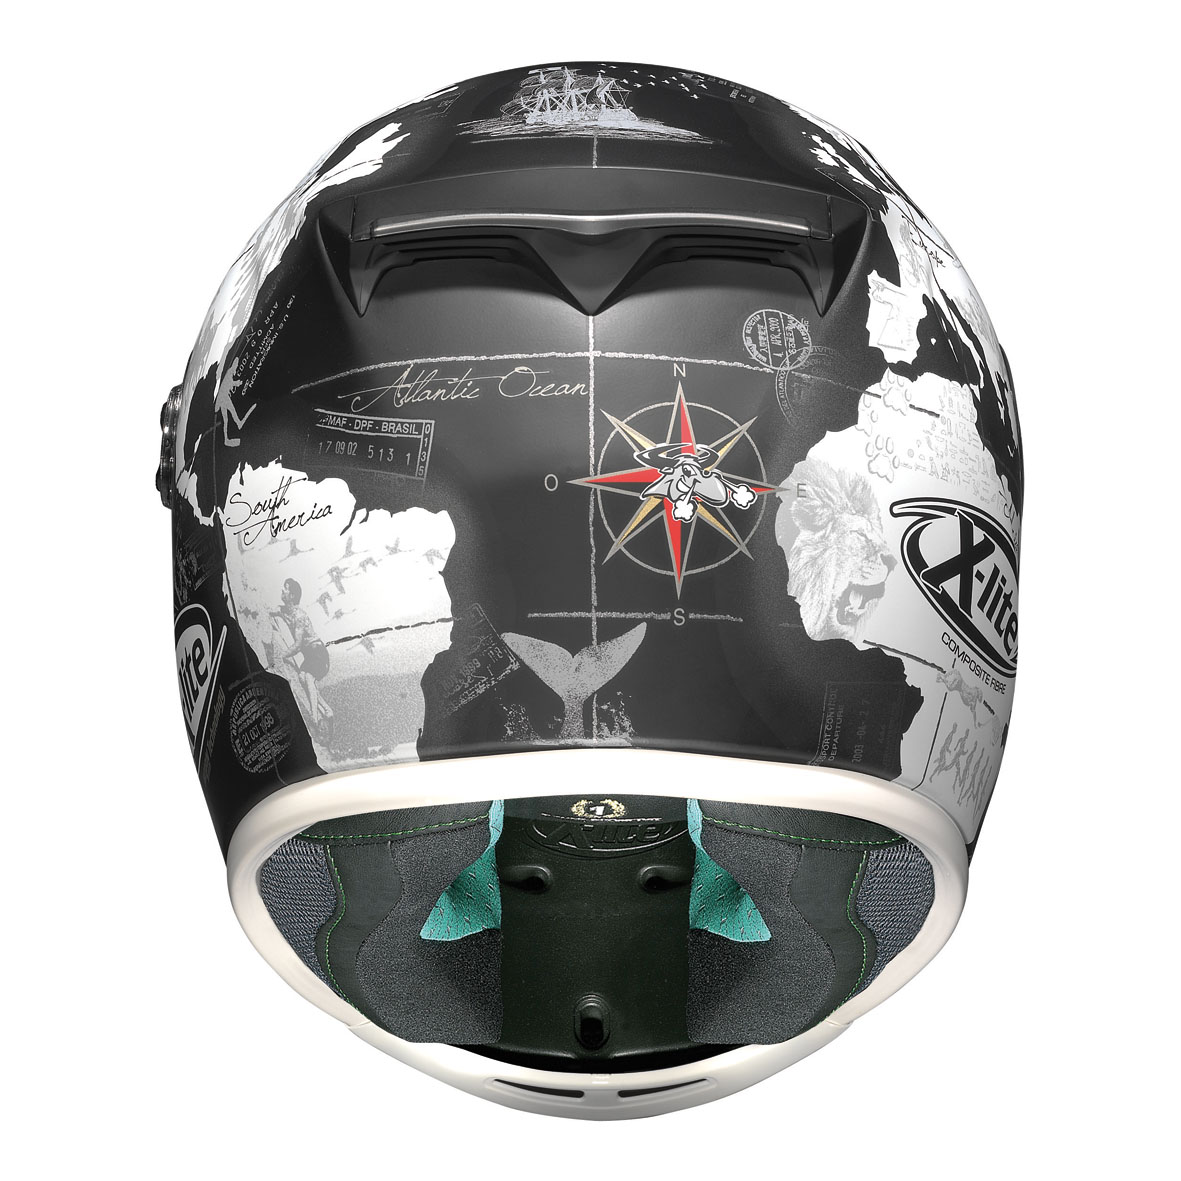 x lite helmet x 802rr replica 37 flat black genial motor s r l. Black Bedroom Furniture Sets. Home Design Ideas